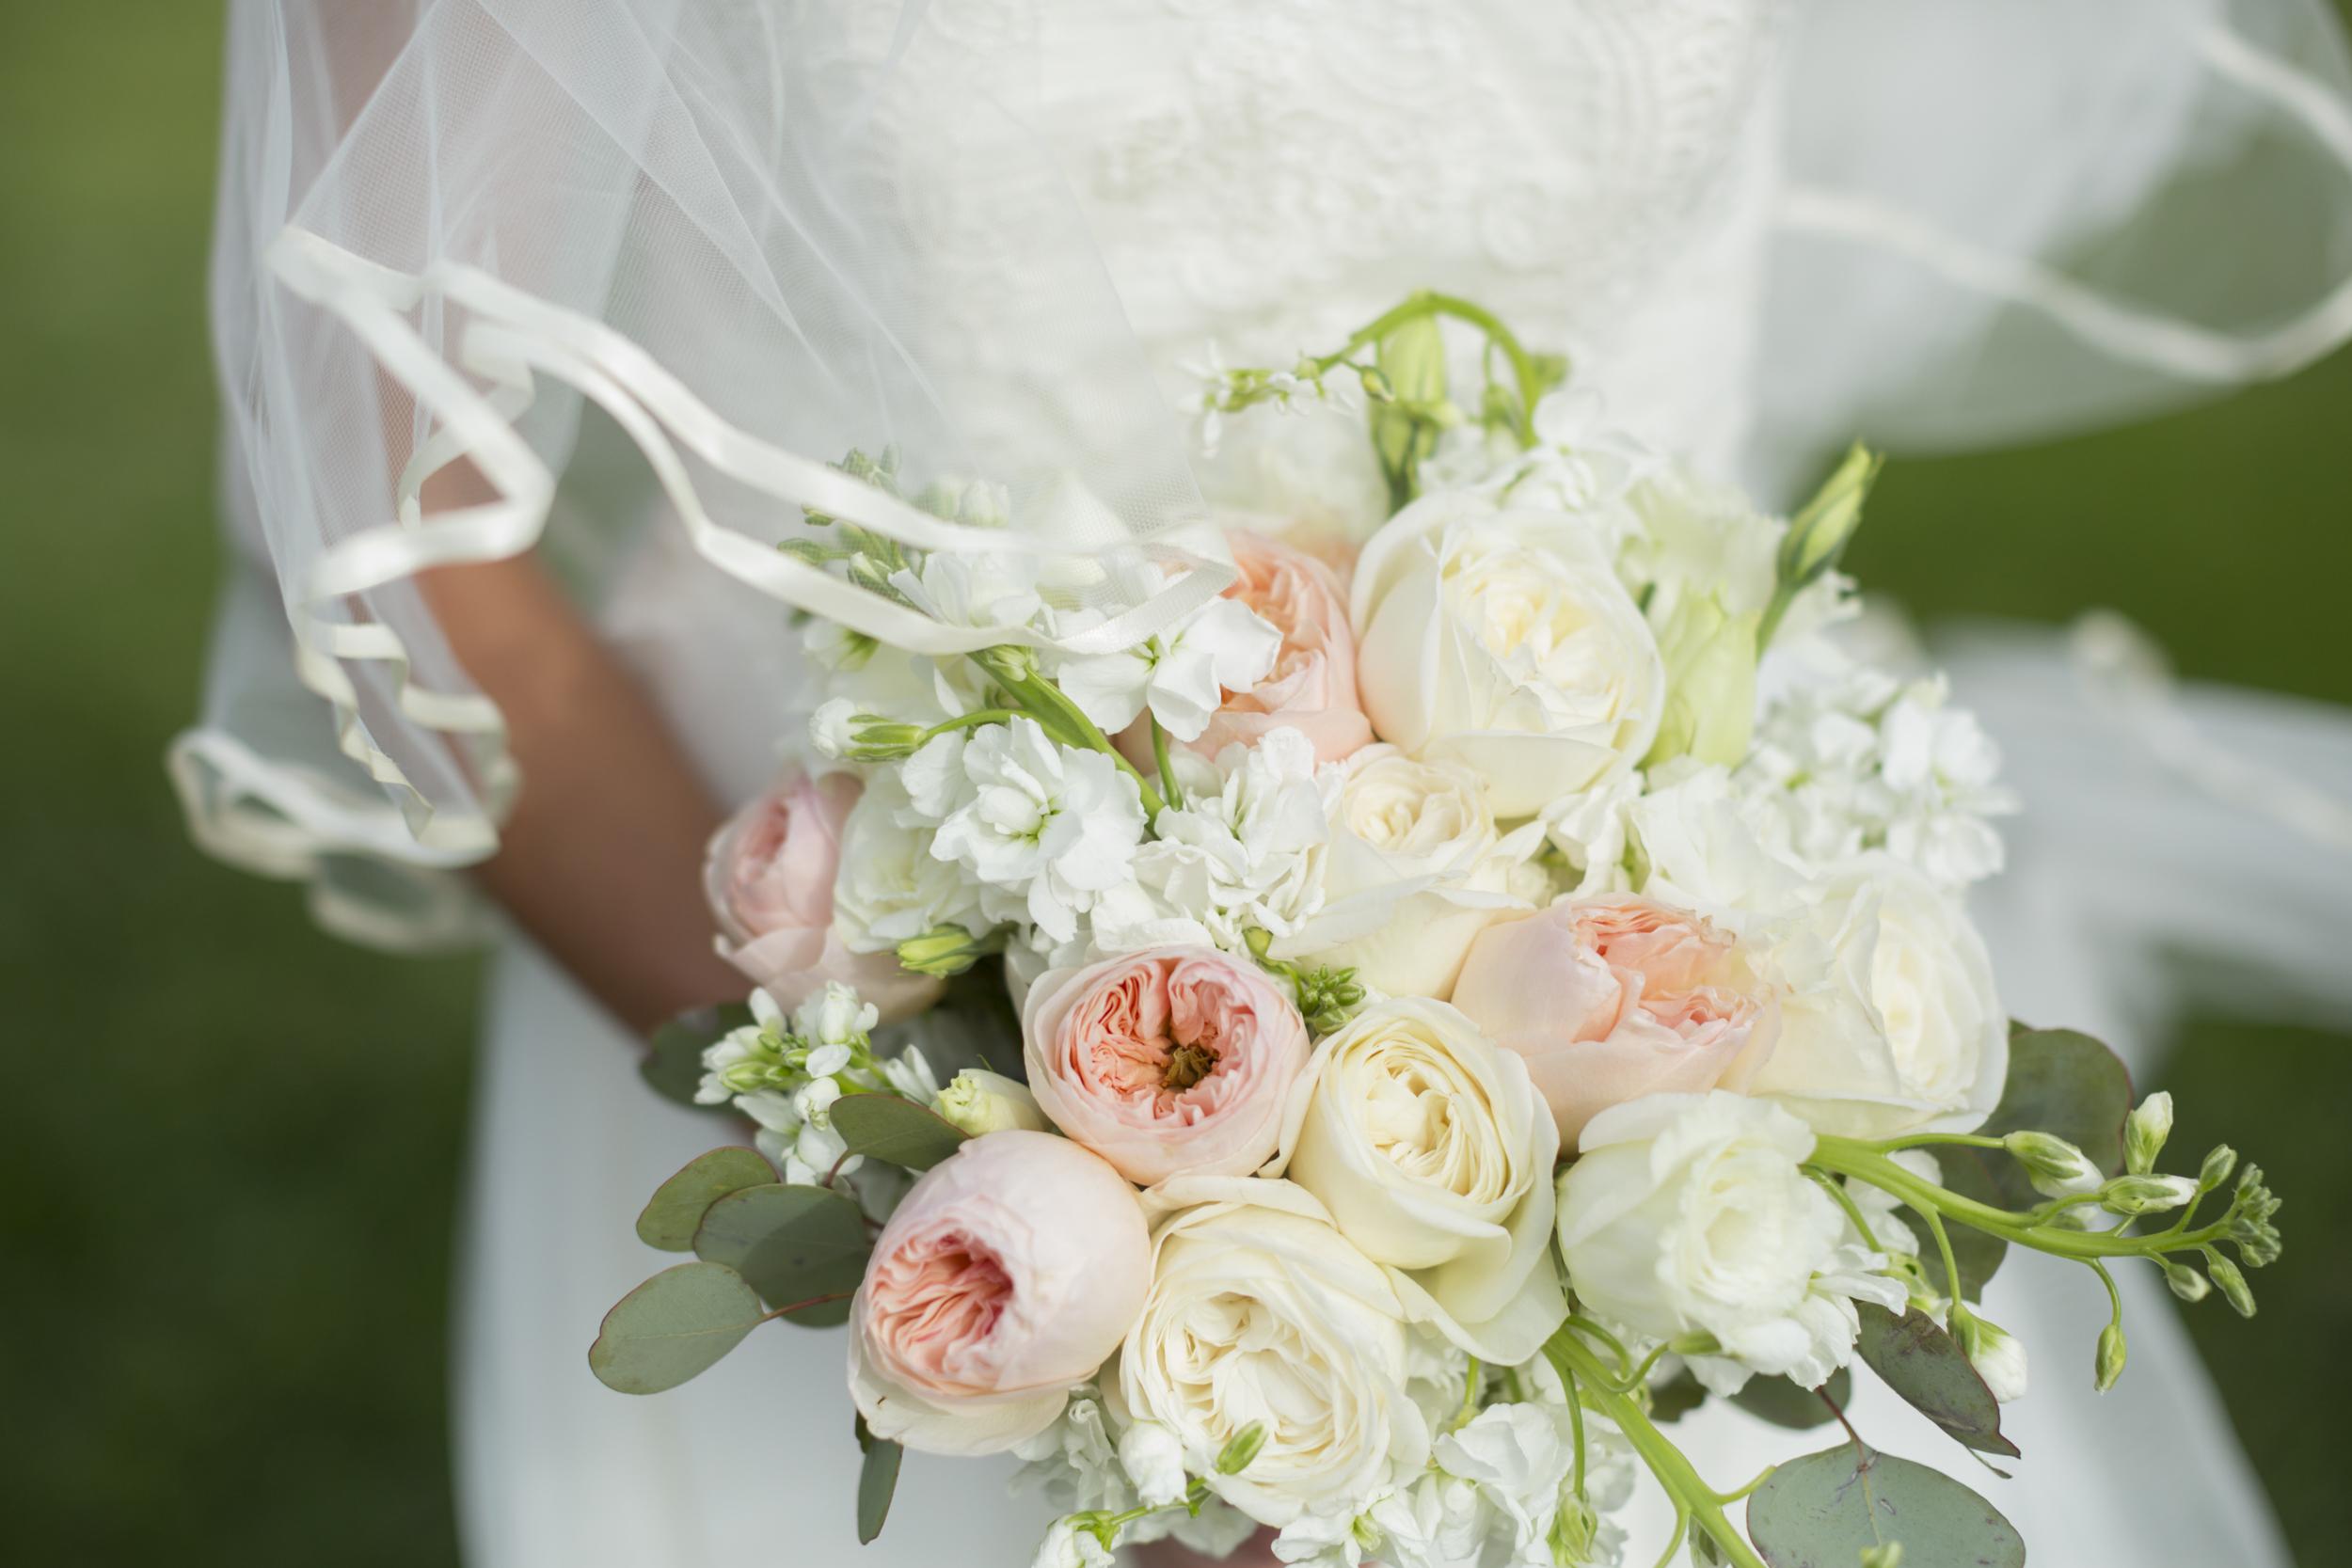 Weddings matzke photo clarissa and luke izmirmasajfo